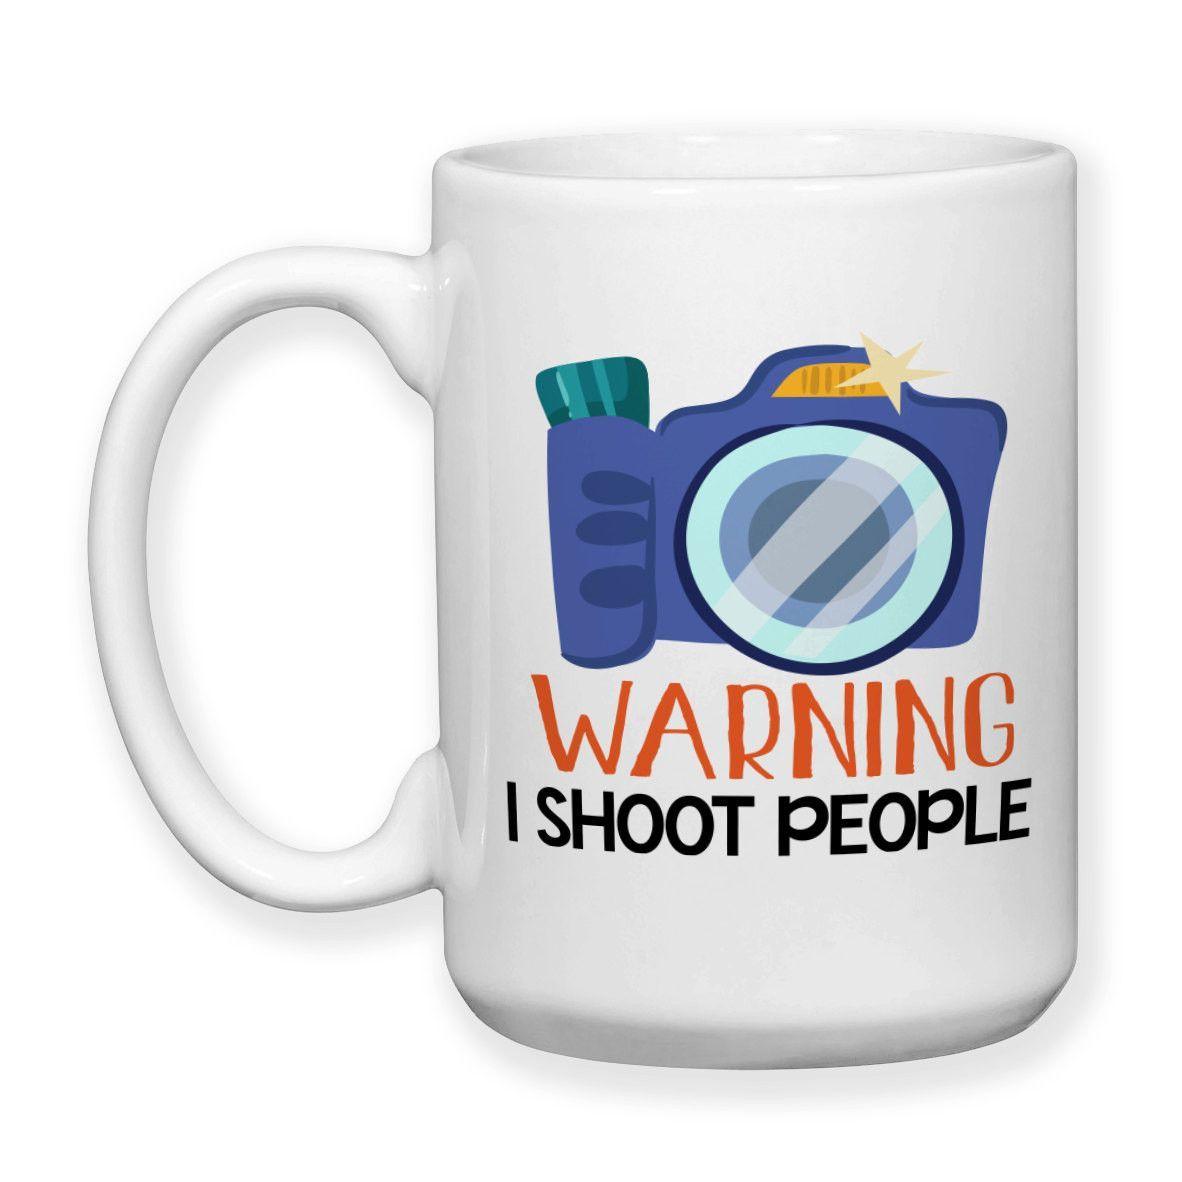 Warning, I Shoot People, Photography, Photographers, Photographers Mug, Camera Art, Photo Shoot, Photo Session, 15 oz Coffee Mug